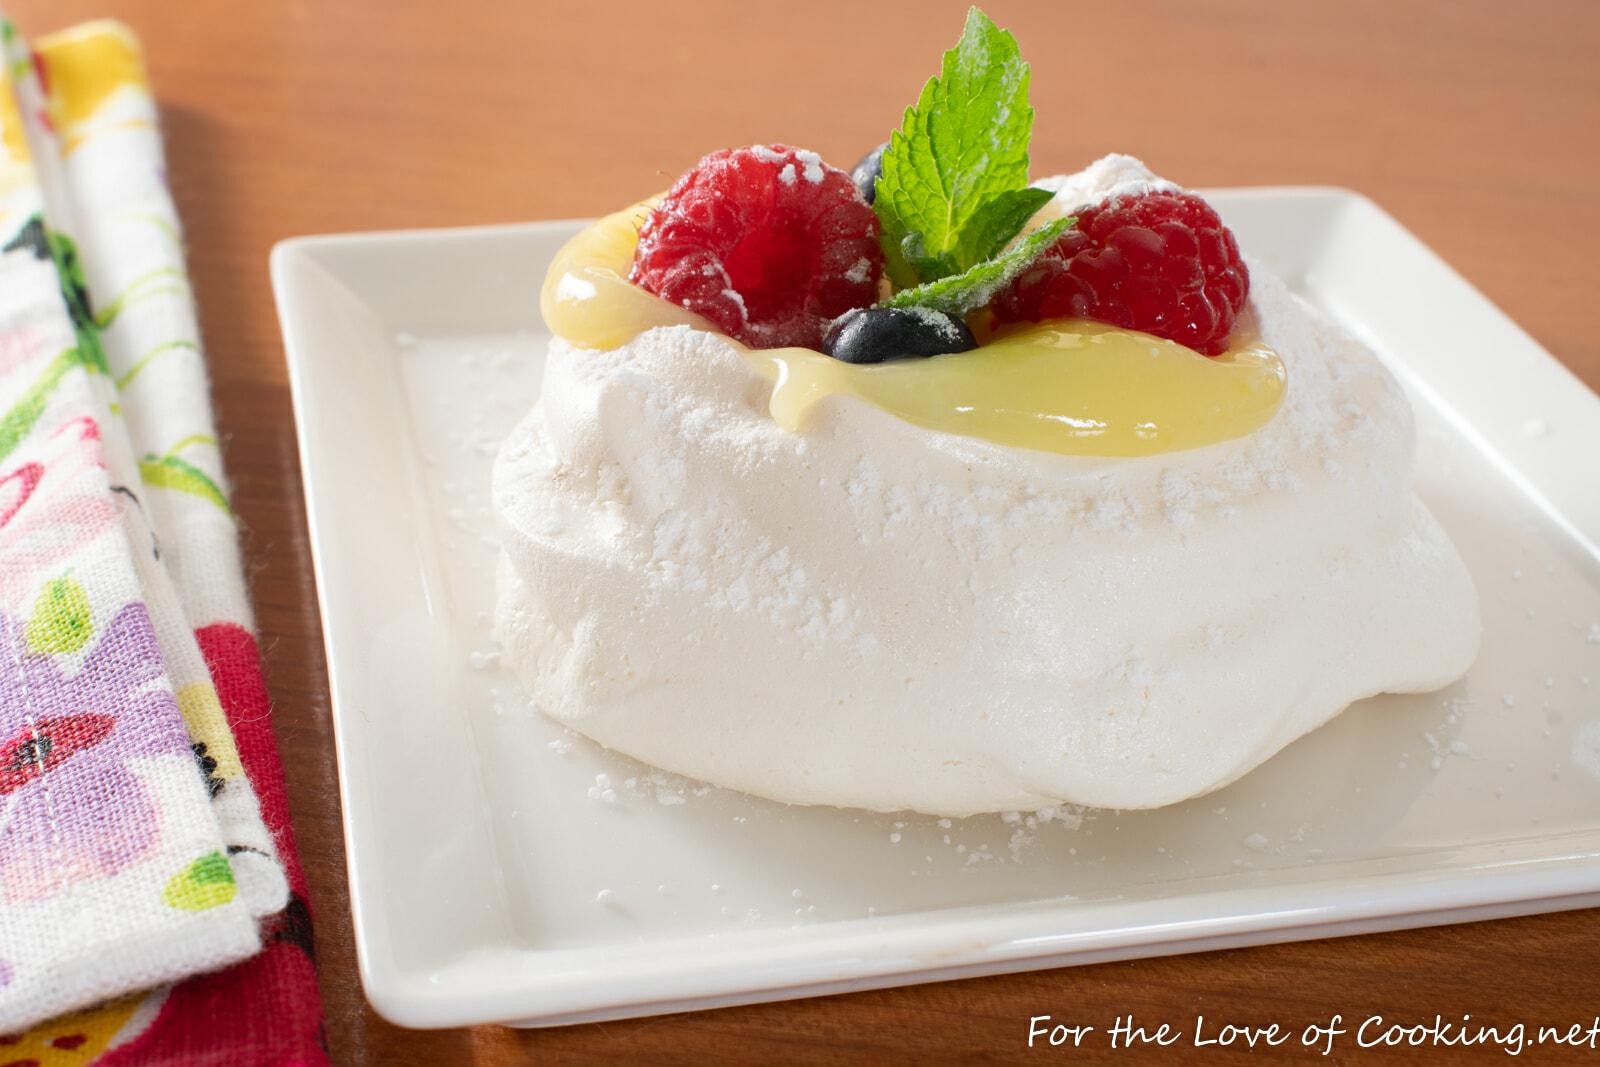 Mini Pavlova with Lemon Curd and Fresh Berries